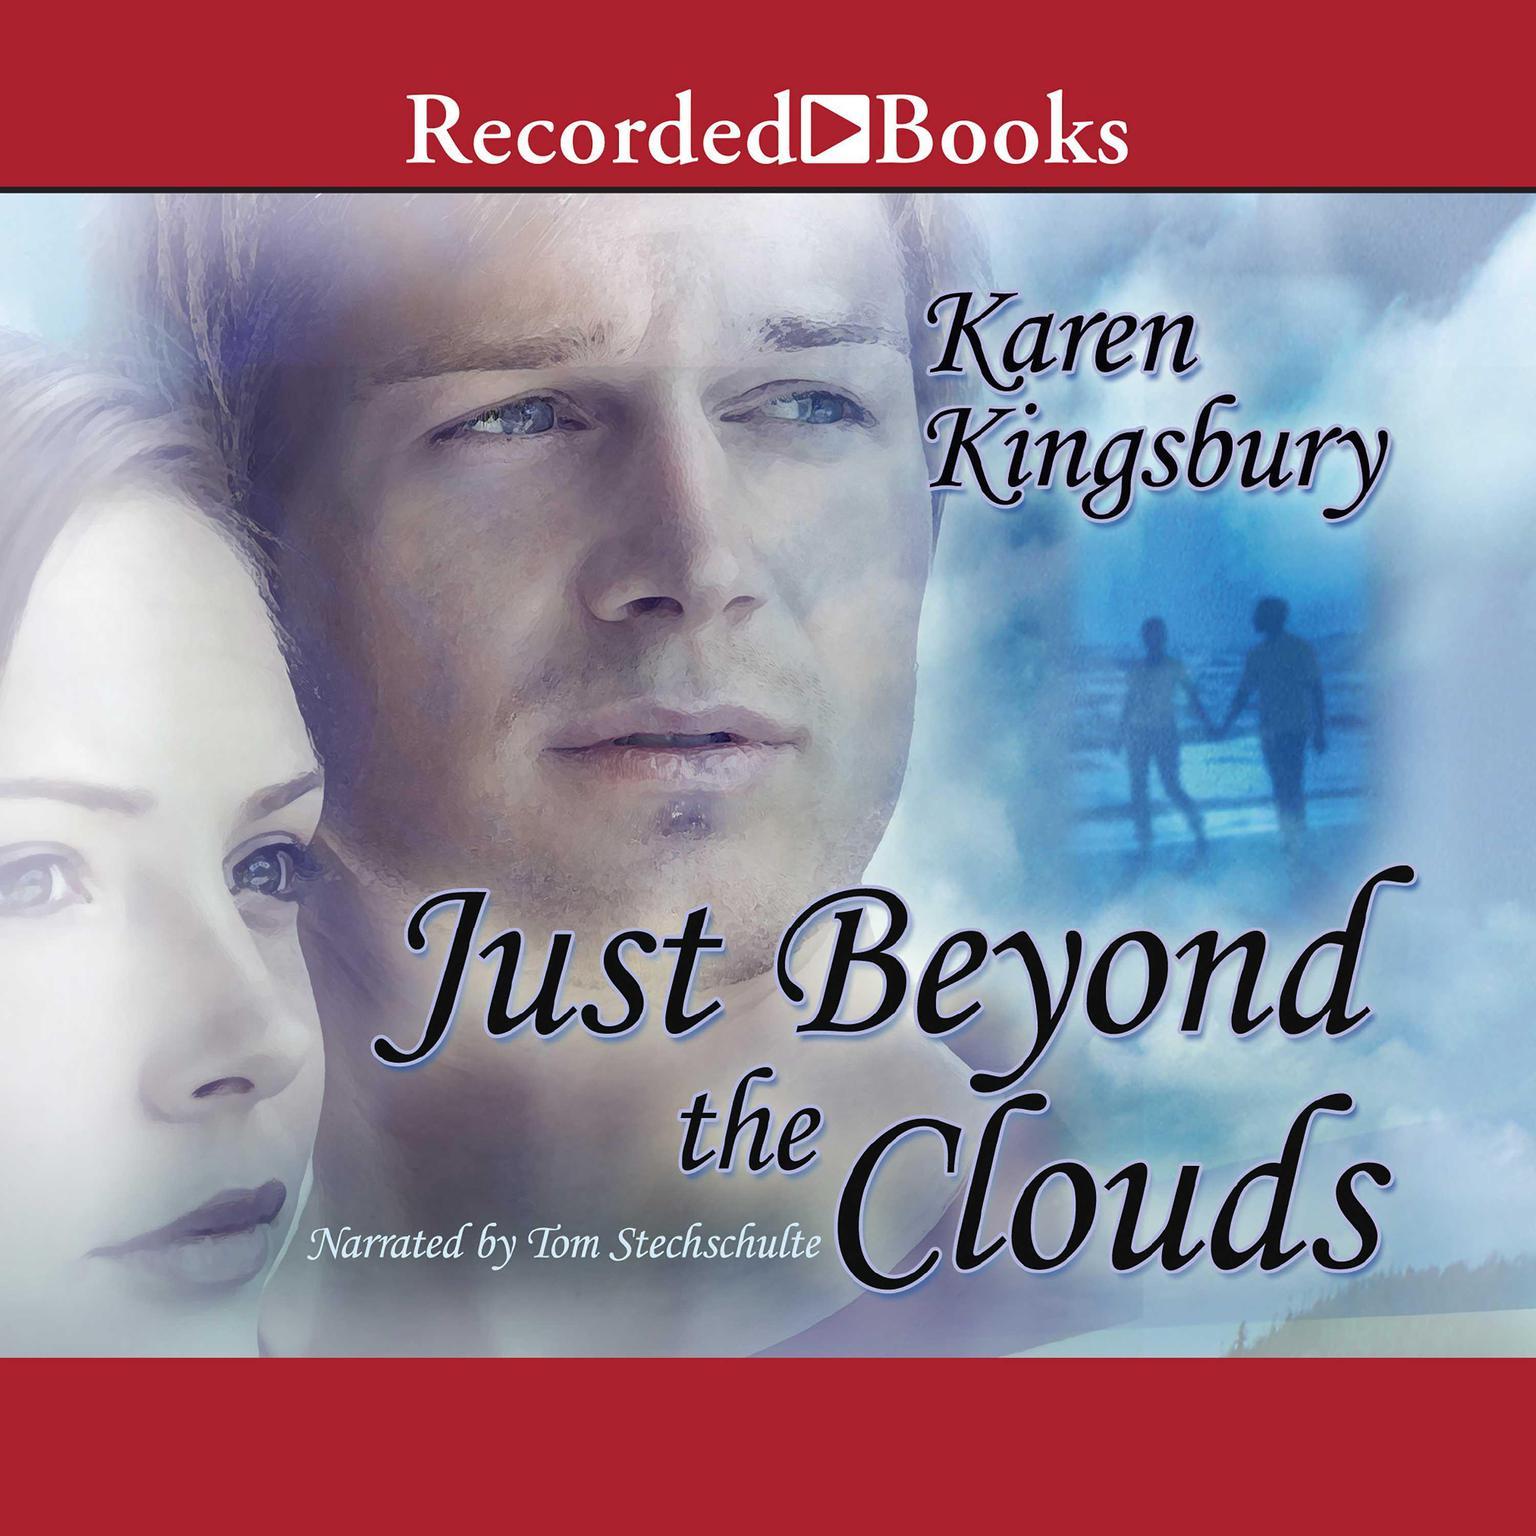 Just Beyond the Clouds: A Novel Audiobook, by Karen Kingsbury